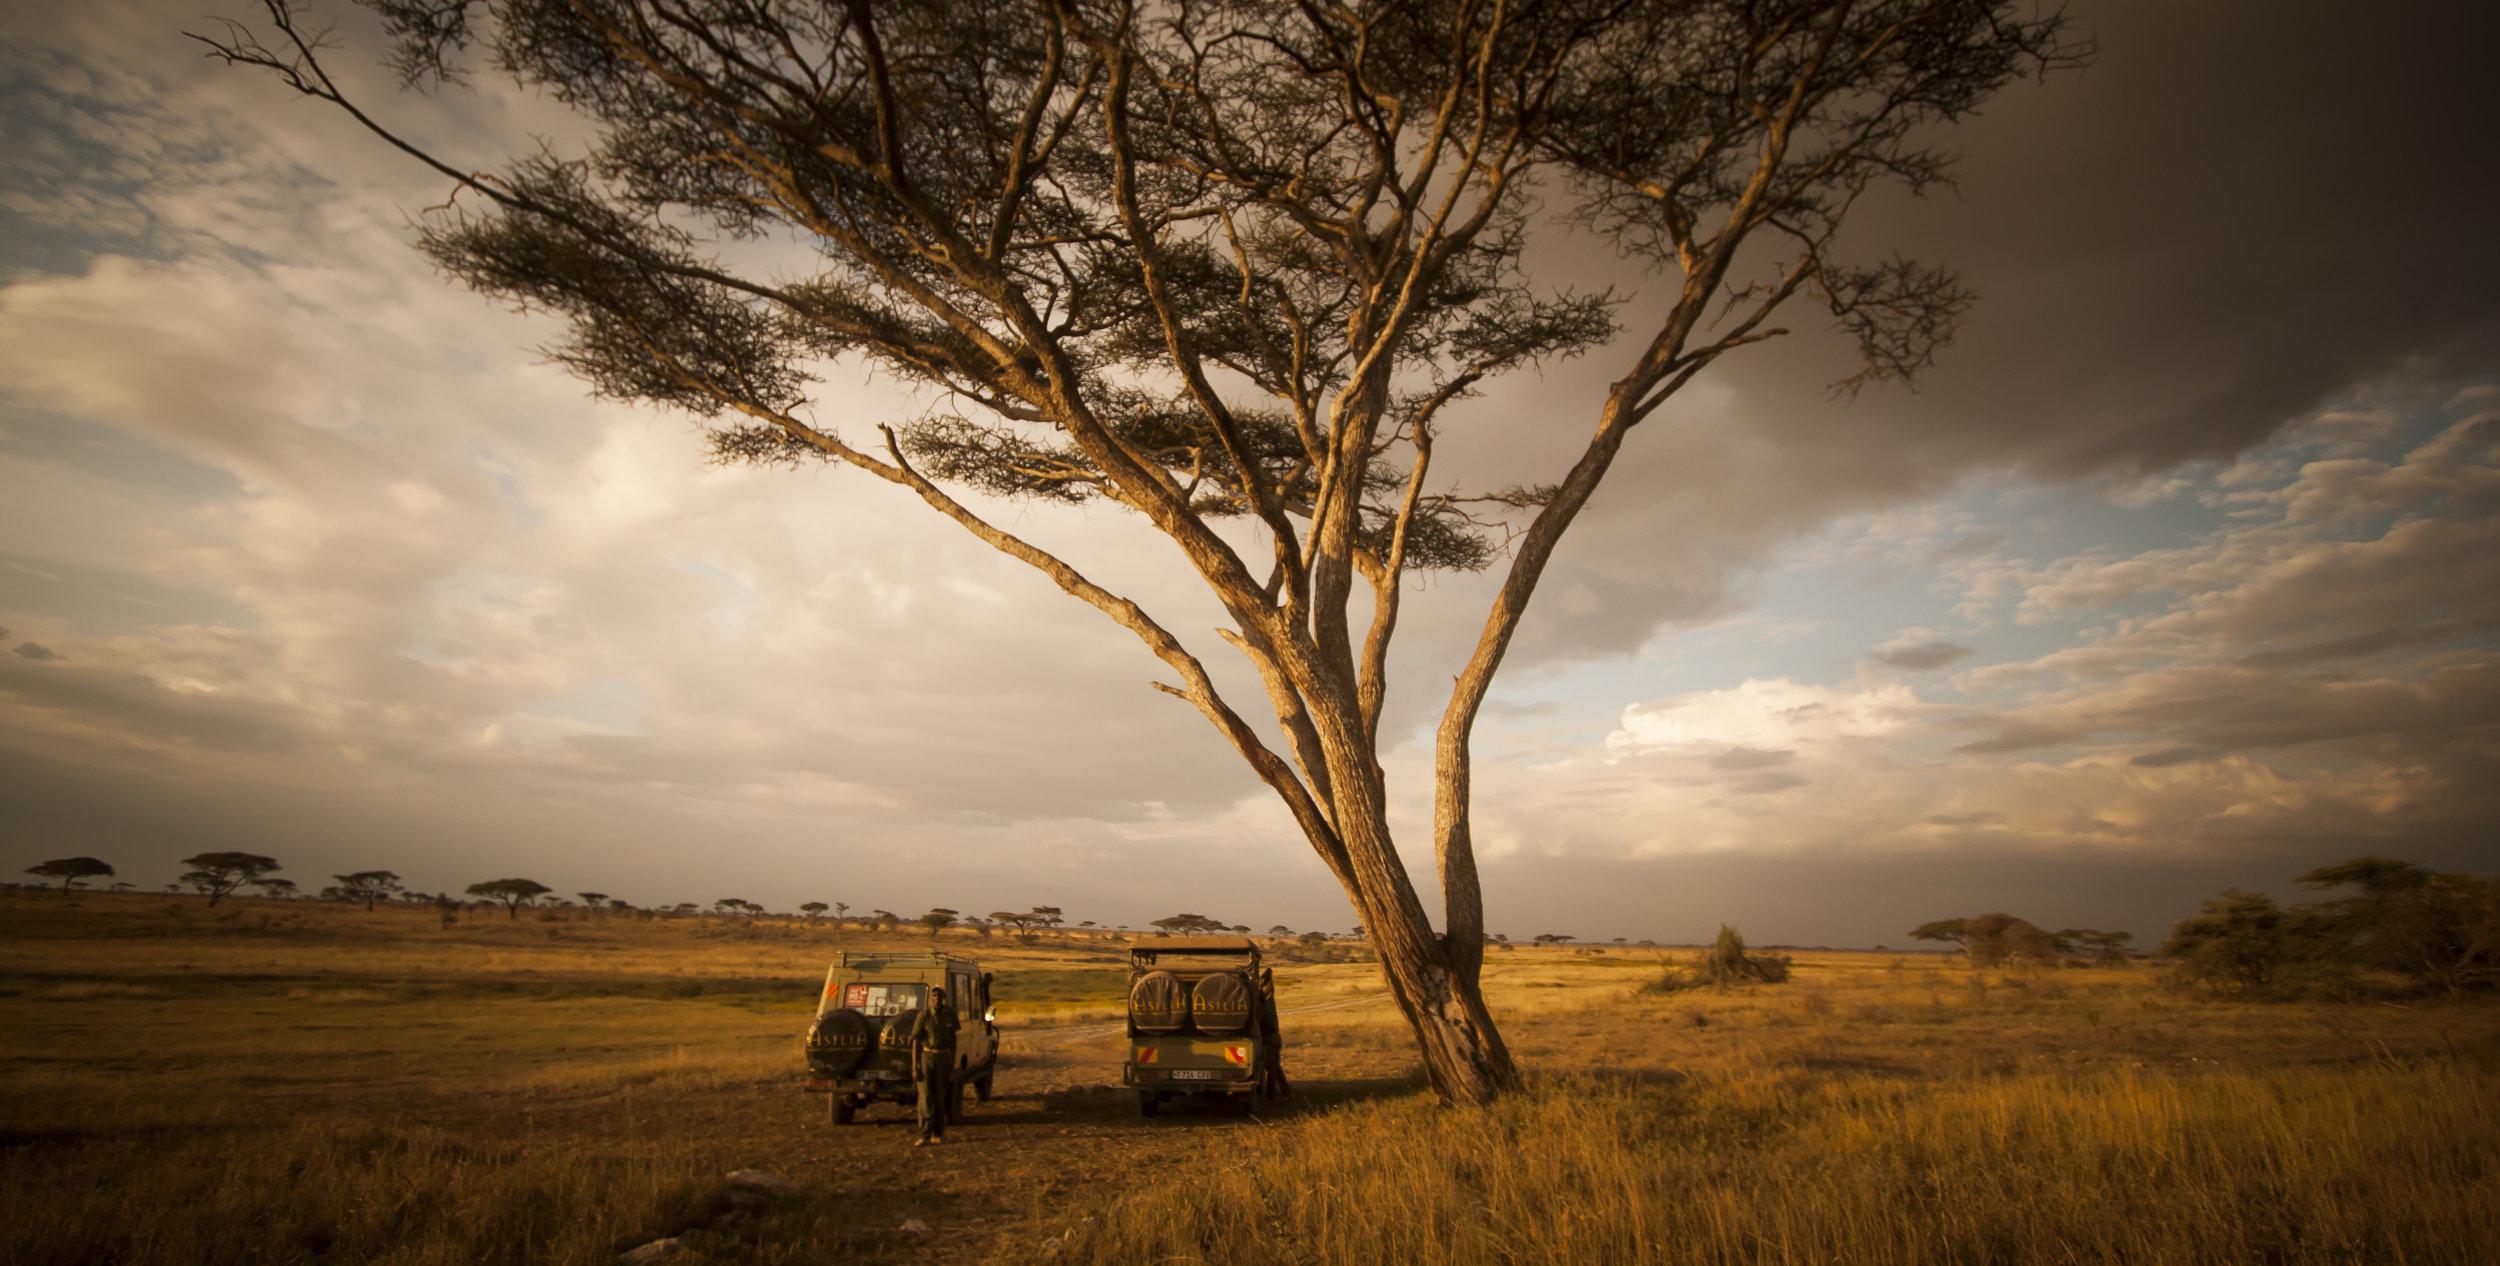 Game-Drive-Vehicles-Serengeti-Eric-Frank-MR.jpg